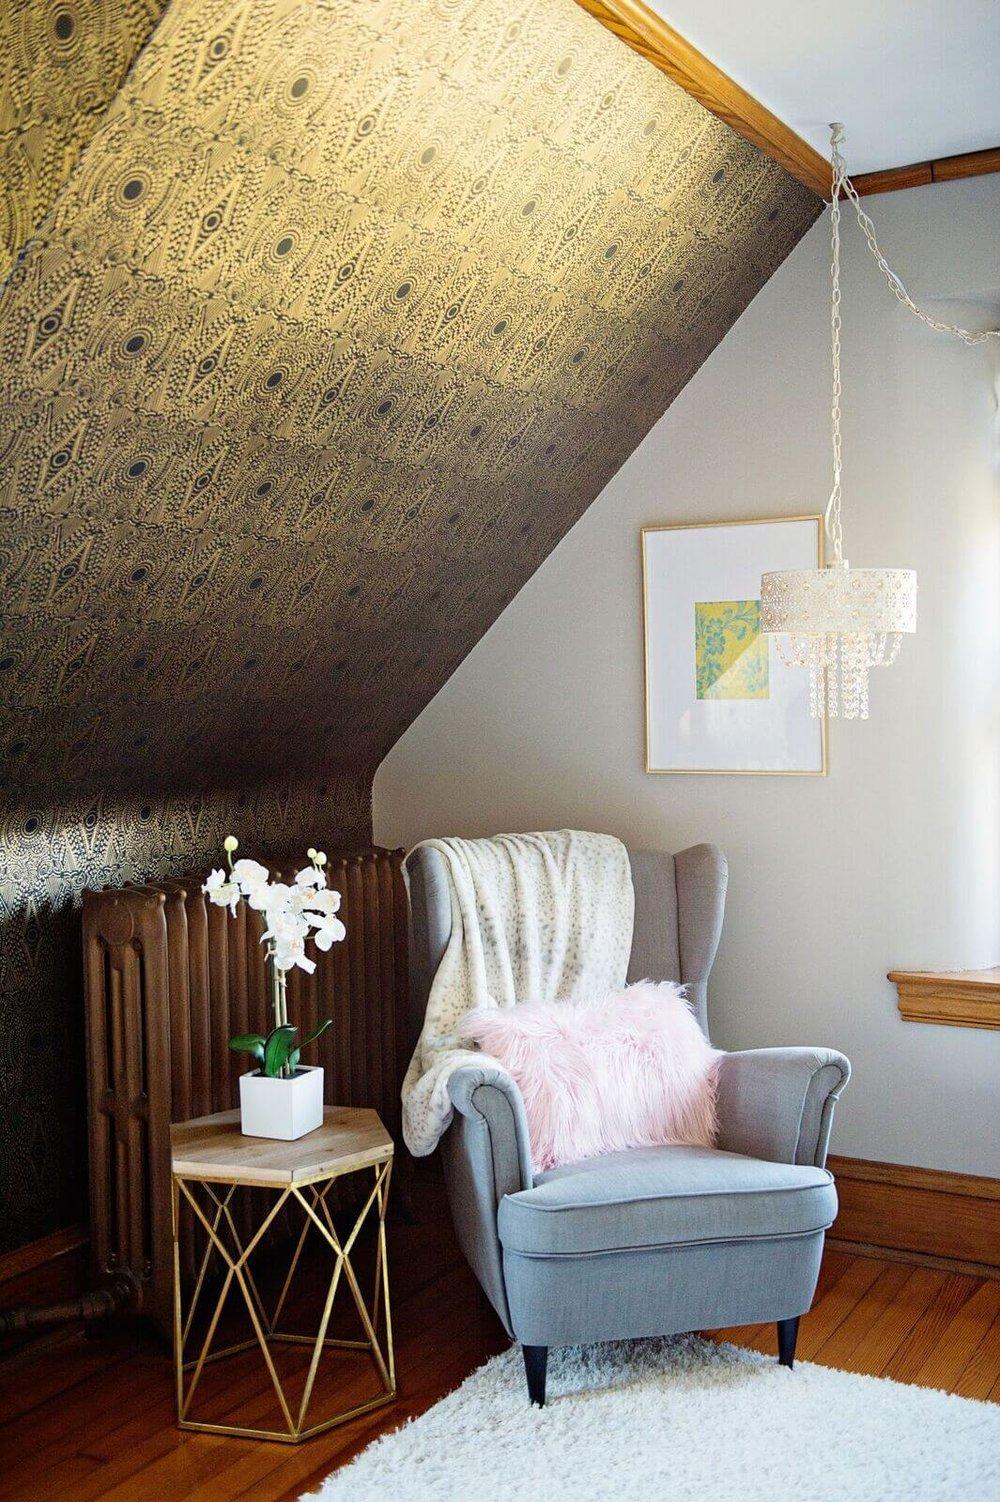 interior-design-bedroom-decor-kids-guest-room-elegant-philadelphia-pa-2.jpeg